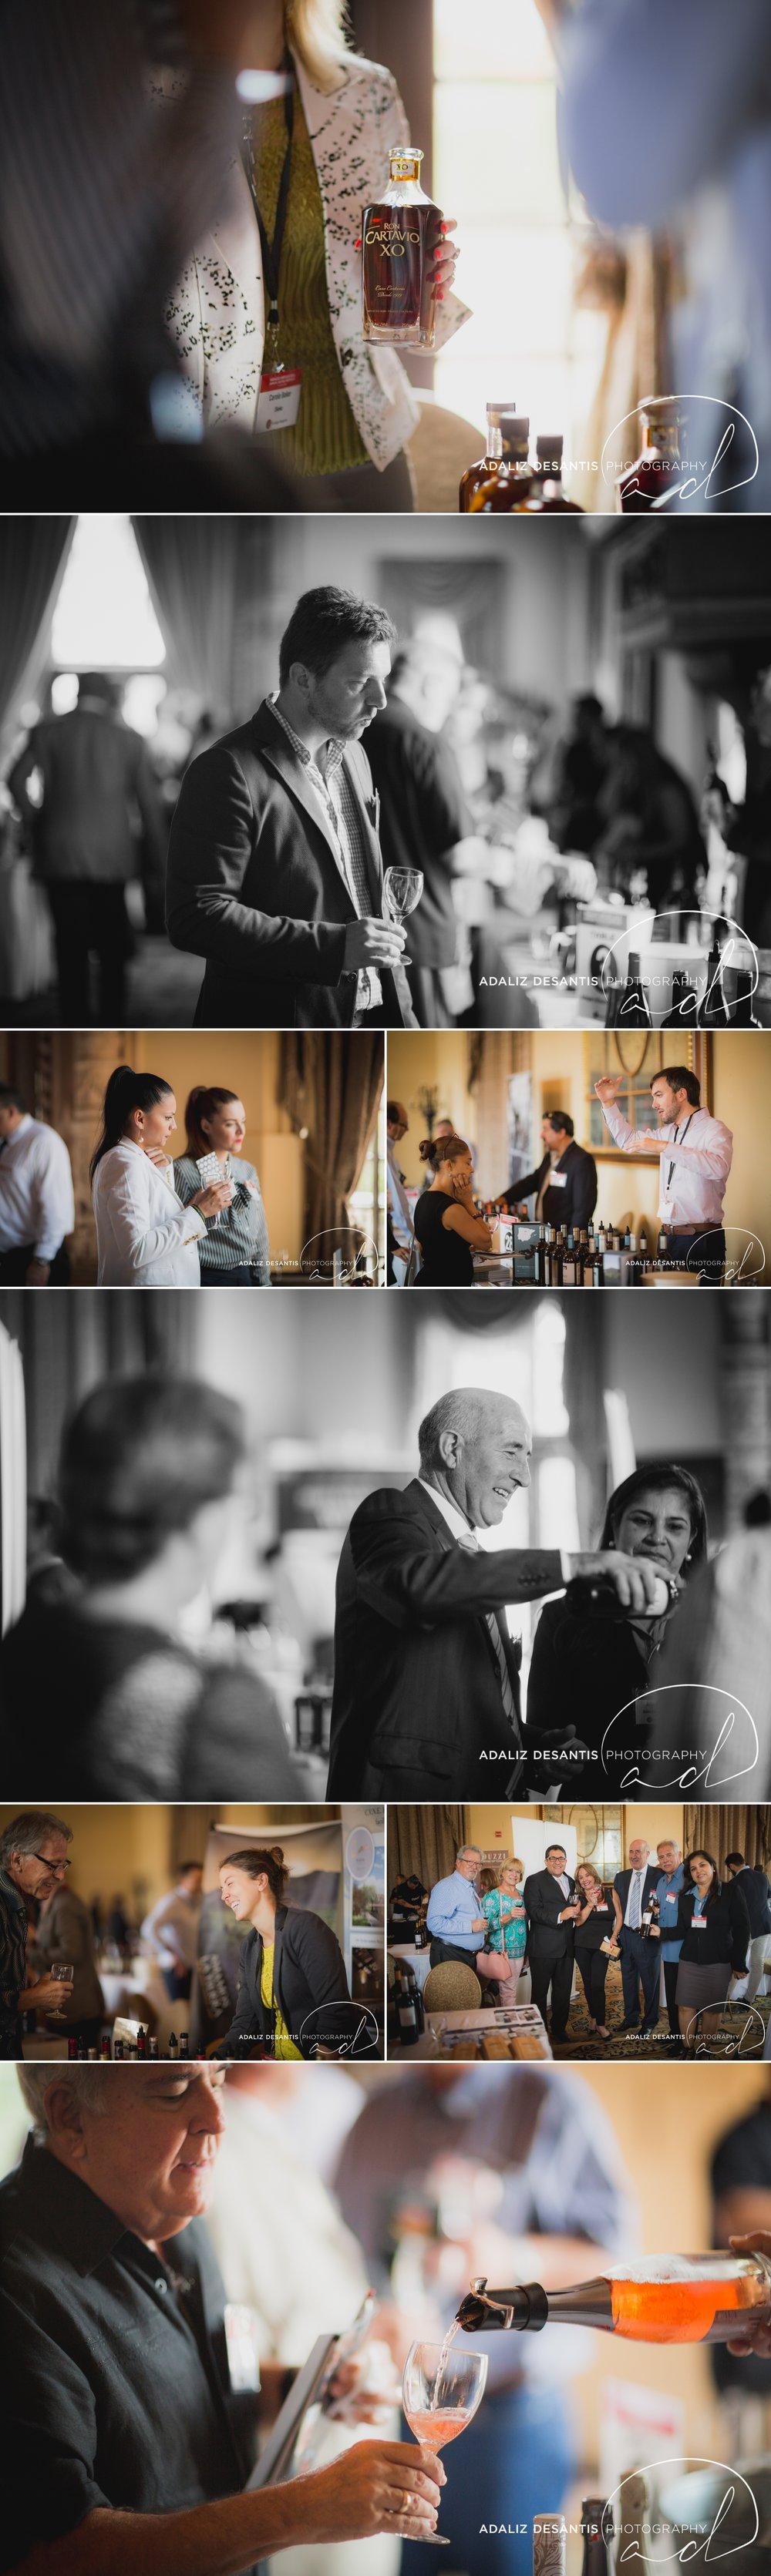 hidalgo imports anniversary wine spirits tasting biltmore hotel coral gables florida miami 3.jpg